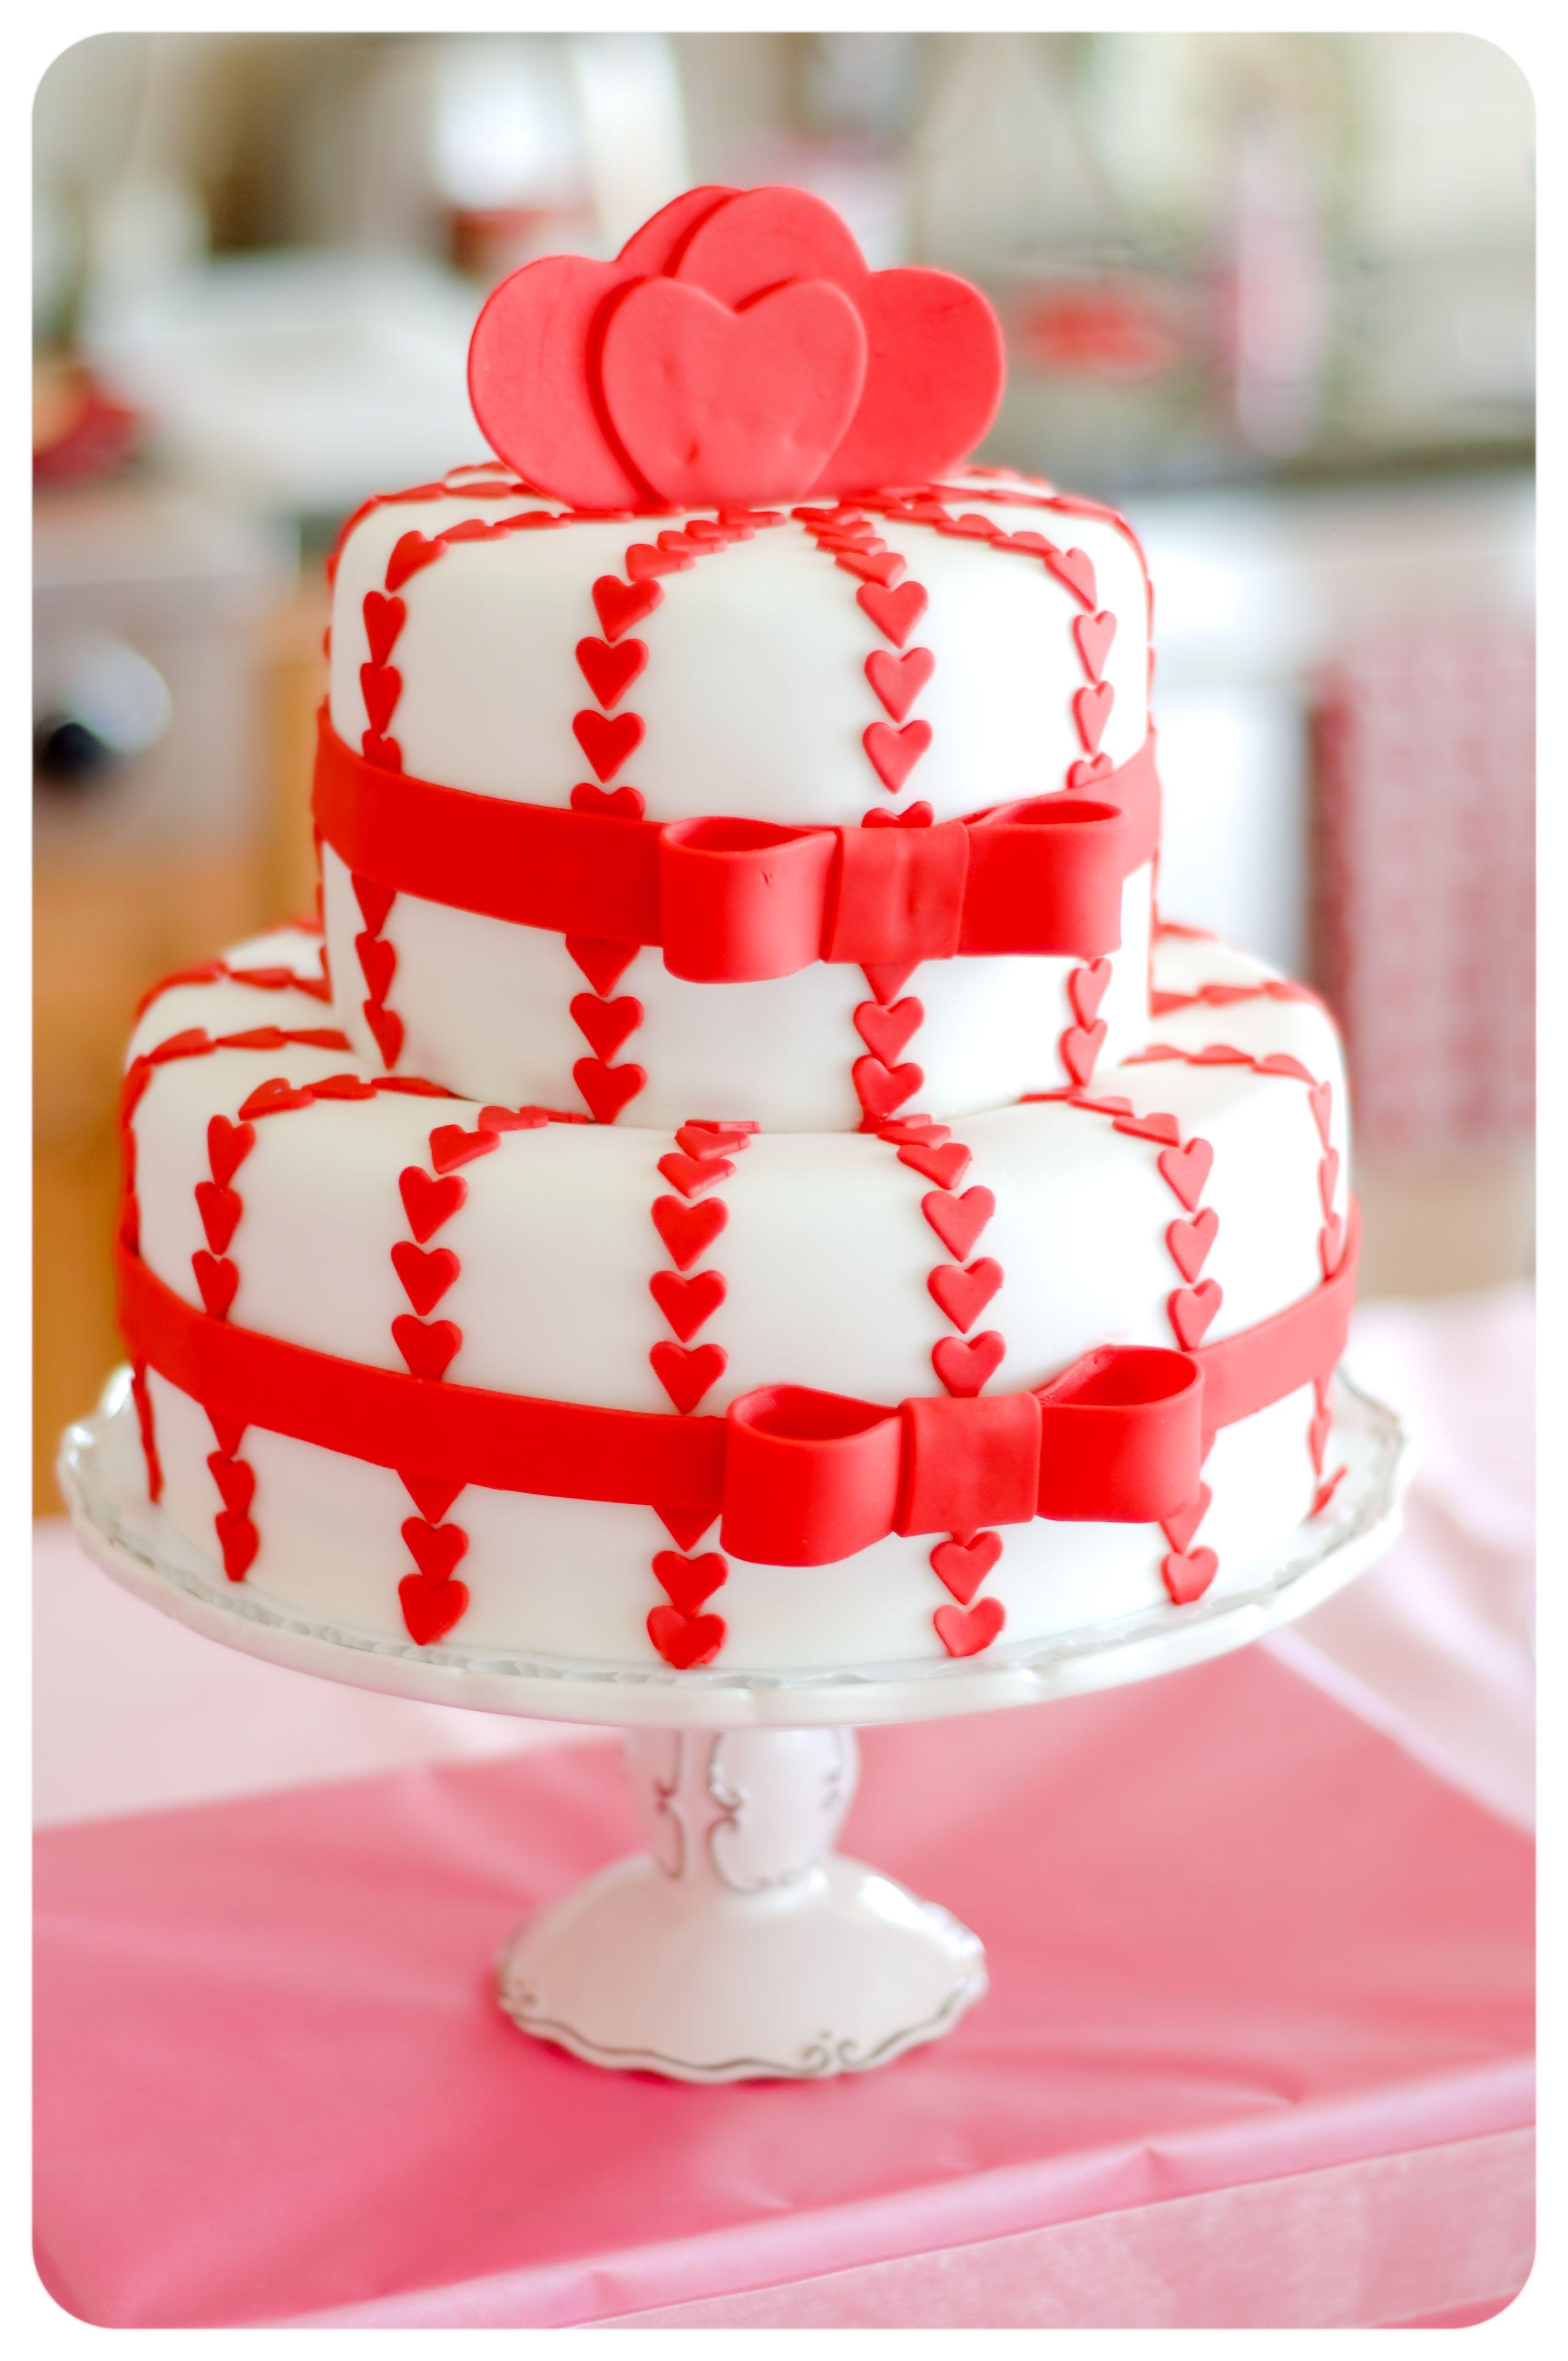 Valentines day cake decorating ideas